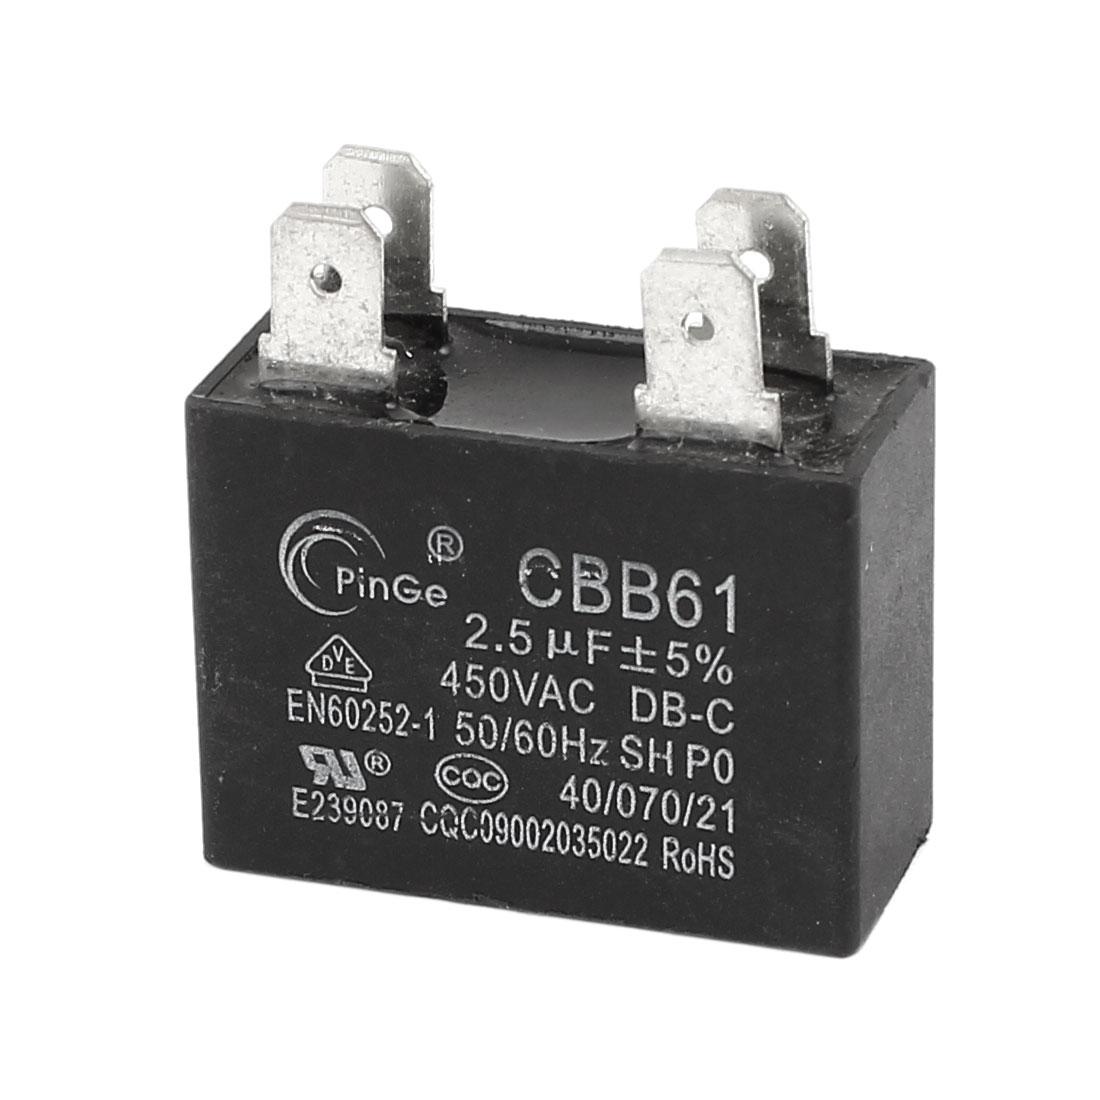 2.5uF MFD AC 450V 50/60Hz 4 Pins Fan Capacitor CBB61